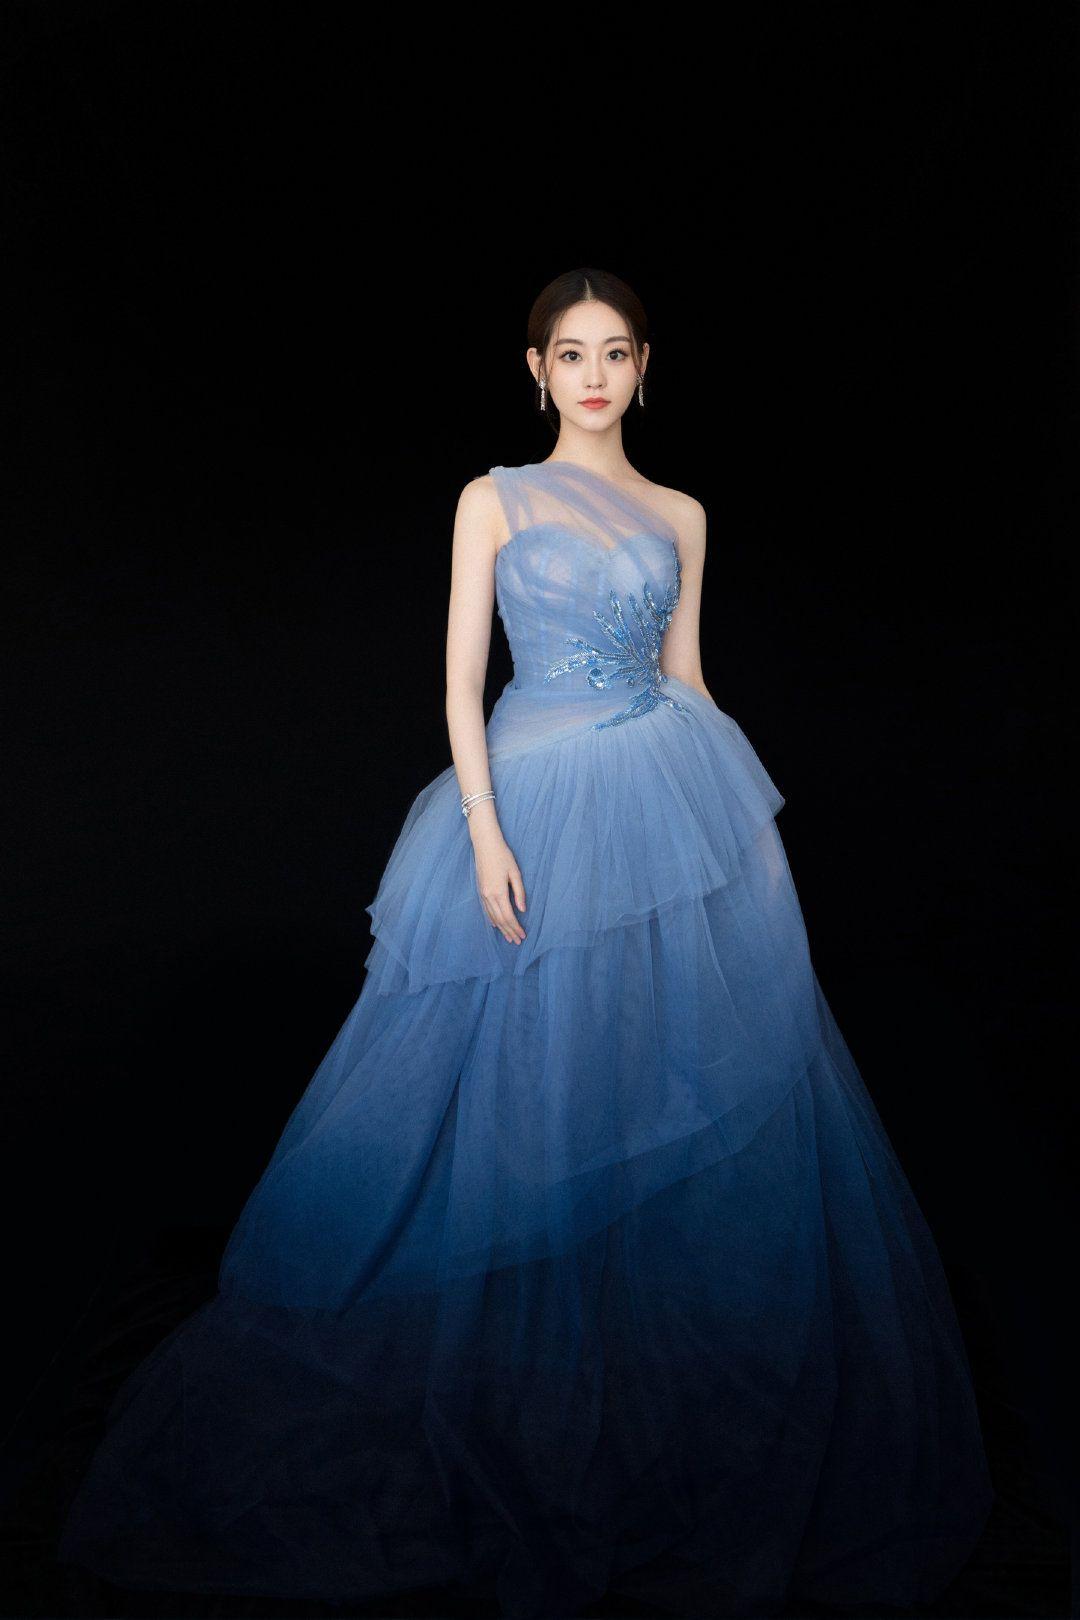 400+ Best Zhu Xudan (Bambi Zhu) images in 2020   bambi, chinese beauty, actresses